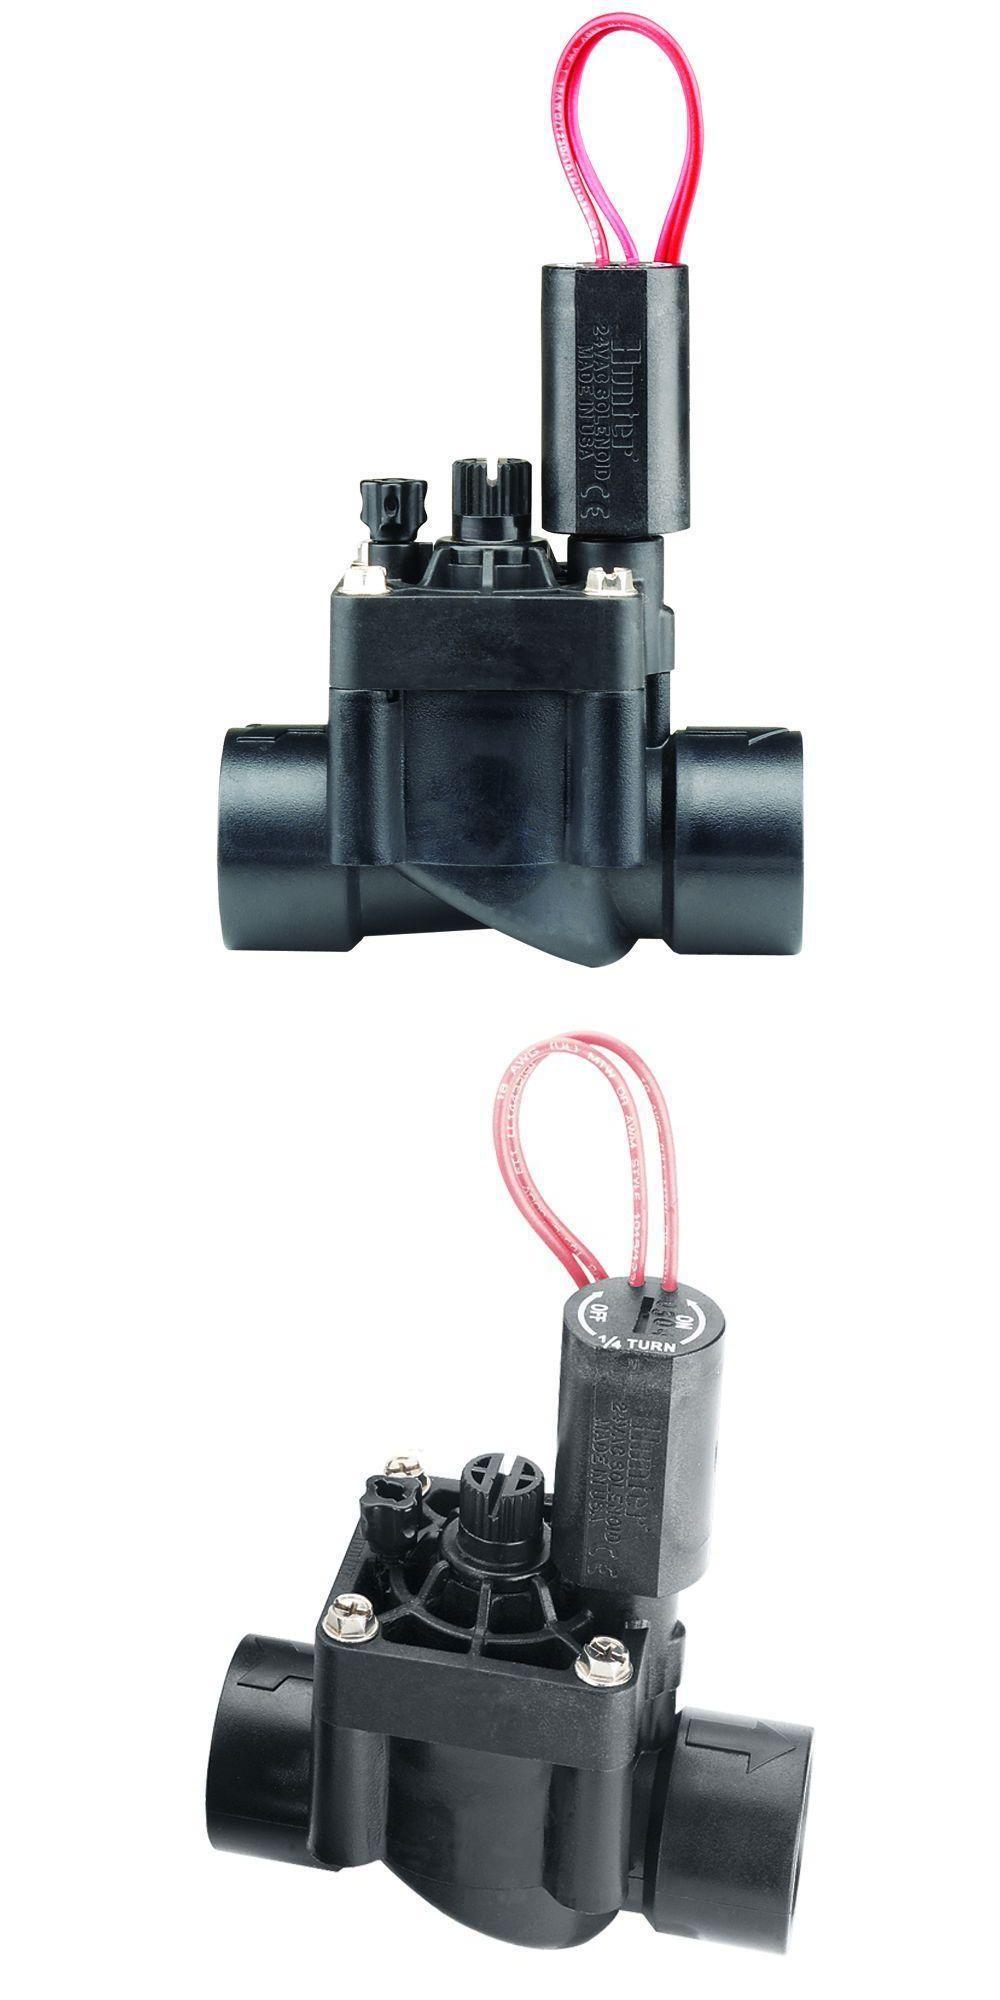 Rainbird RPKASVF100 Rpk Asvf 1 Cap//Cover Assm Kit